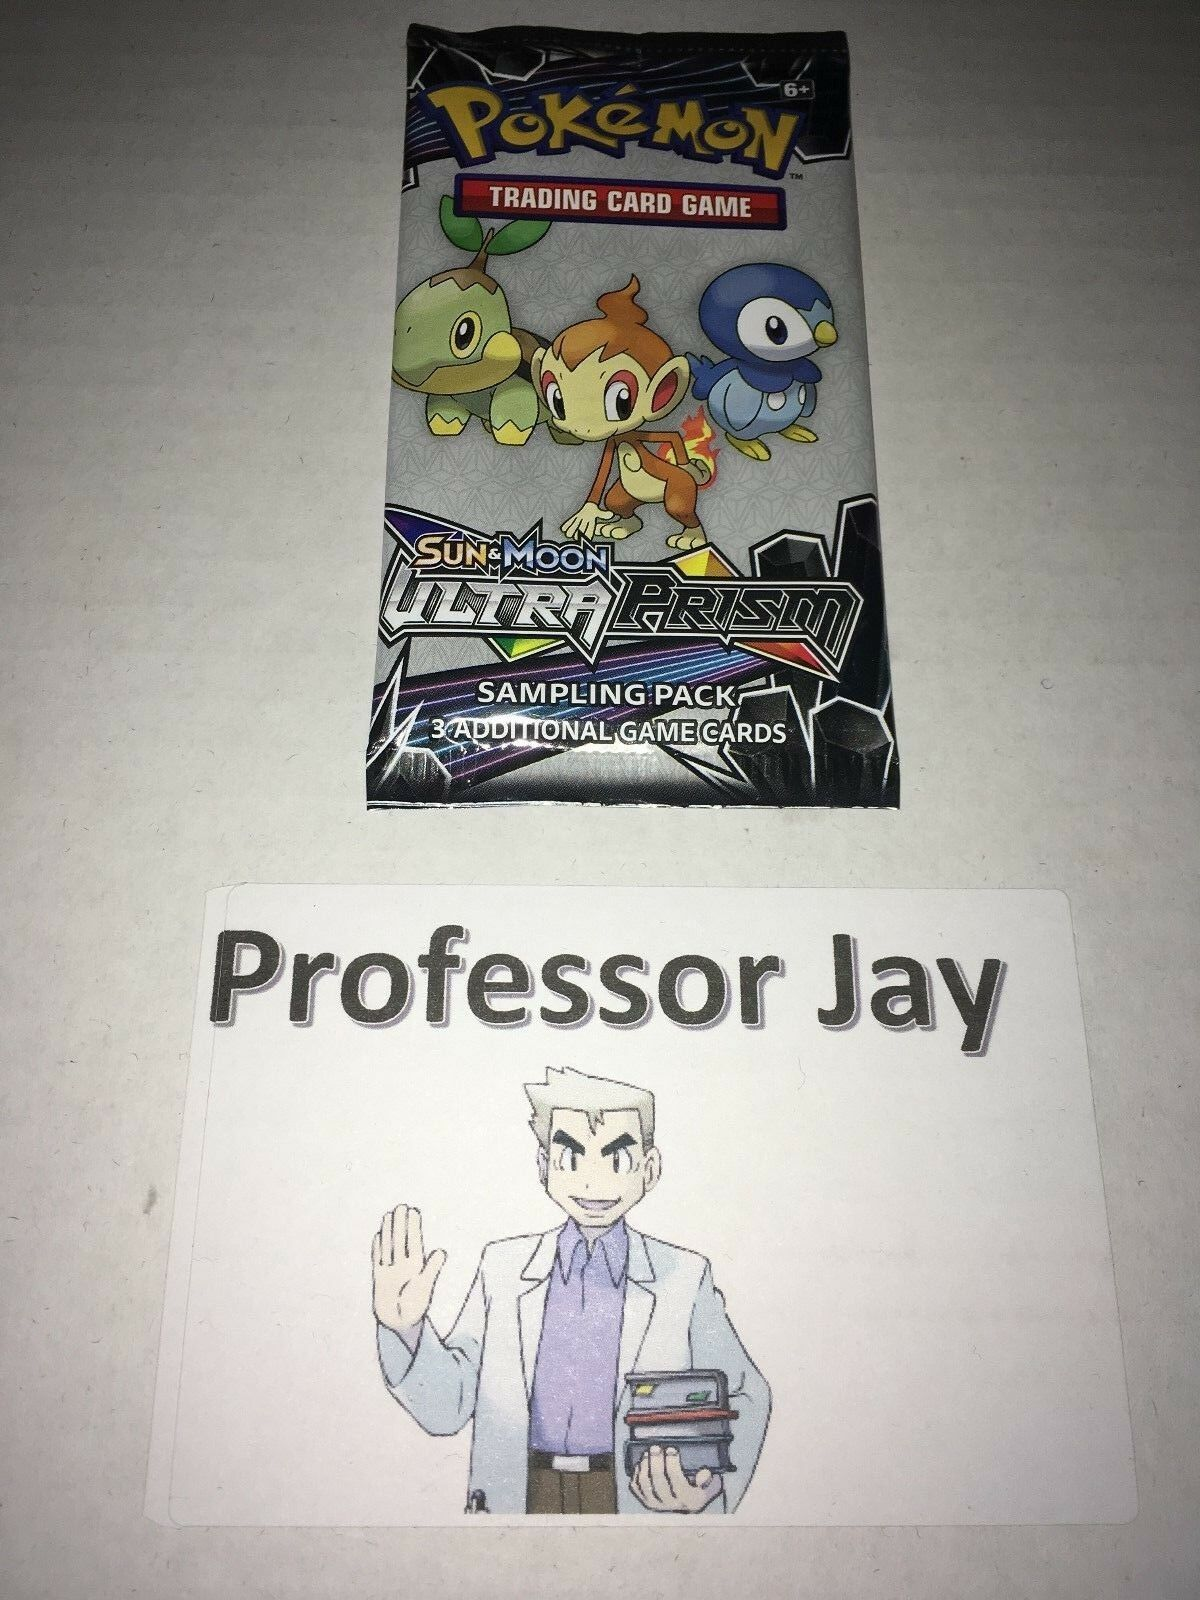 BRAND NEW 3 CARD SAMPLING SAMPLE BOOSTER PACKS Pokemon Cards Pre Ex Lv X